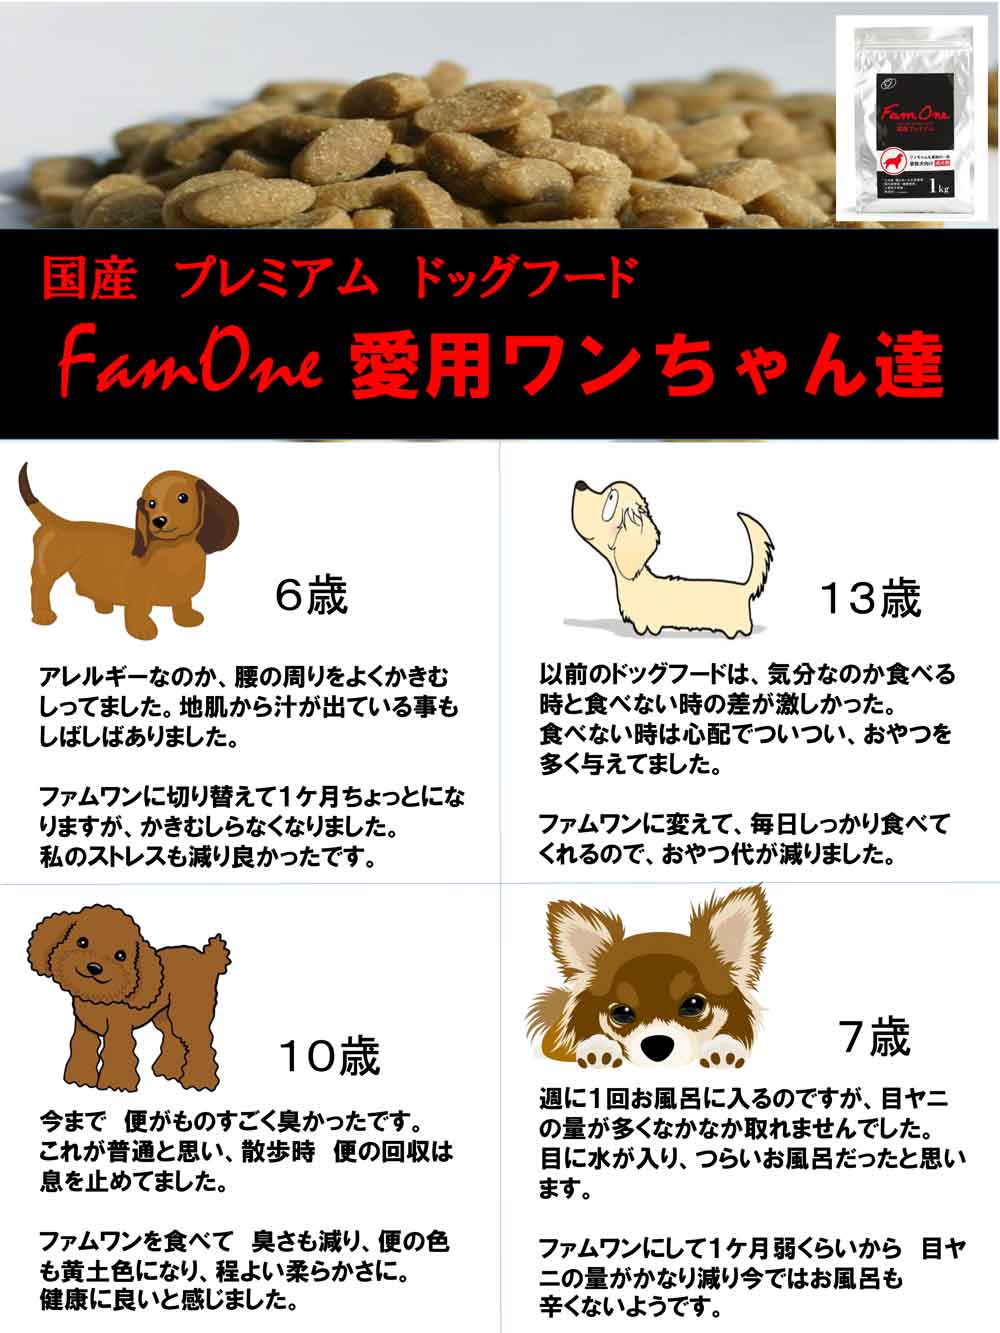 FamOne愛用ワンちゃん達1